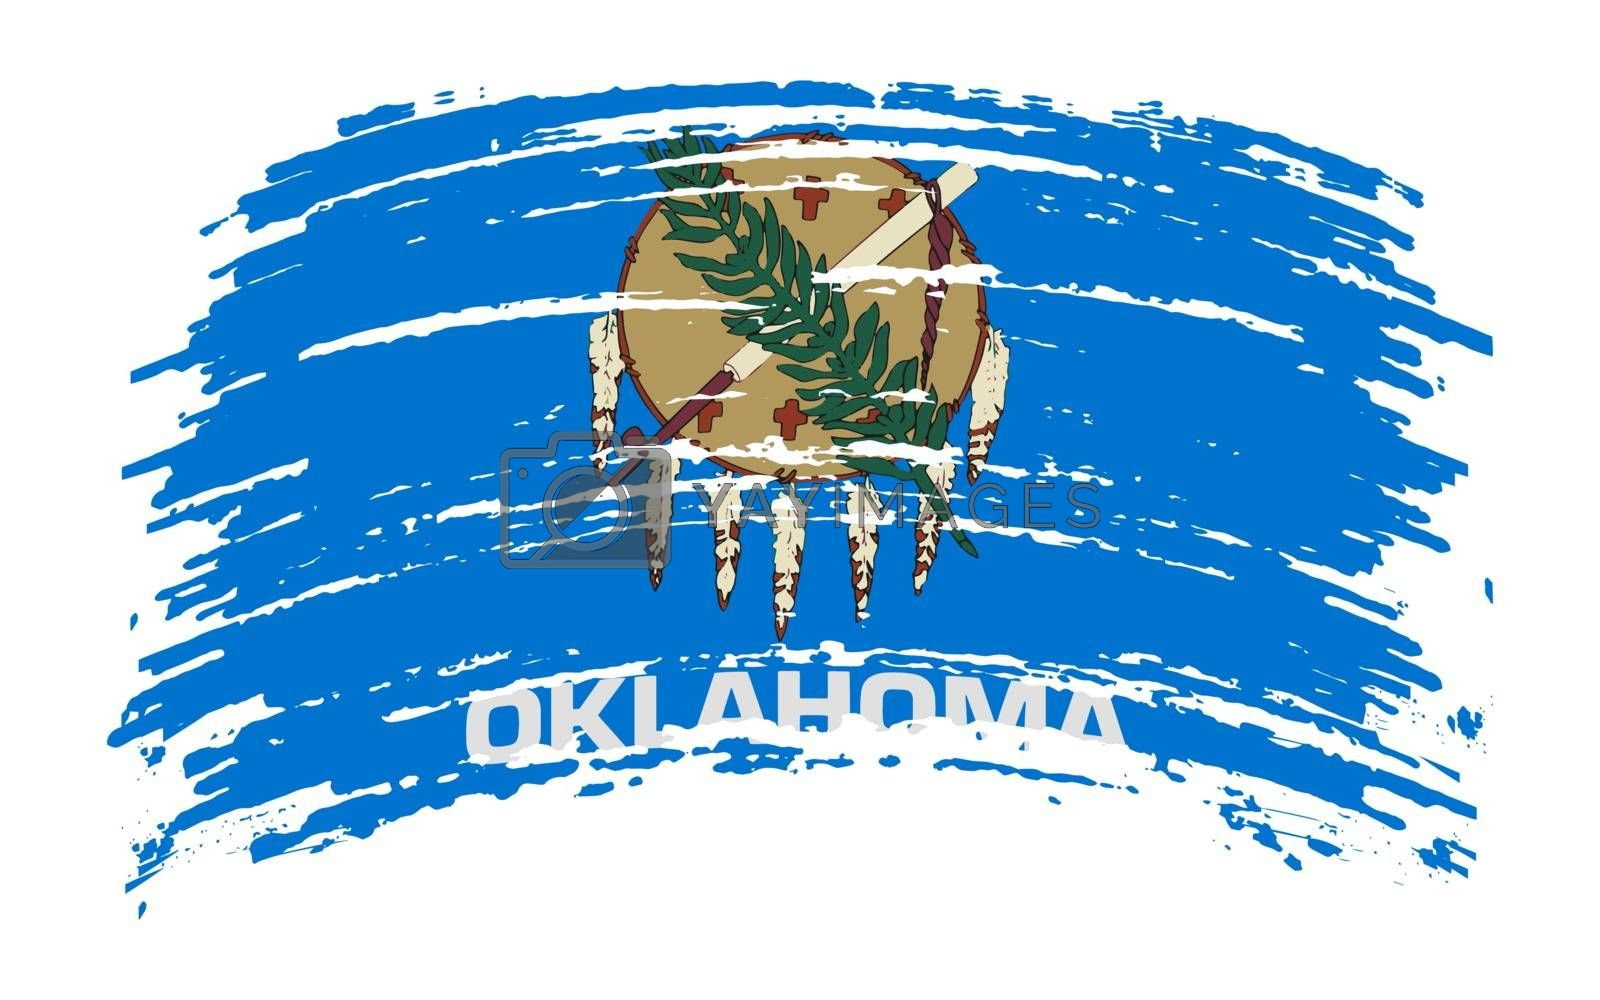 Oklahoma US flag in grunge brush stroke, vector image